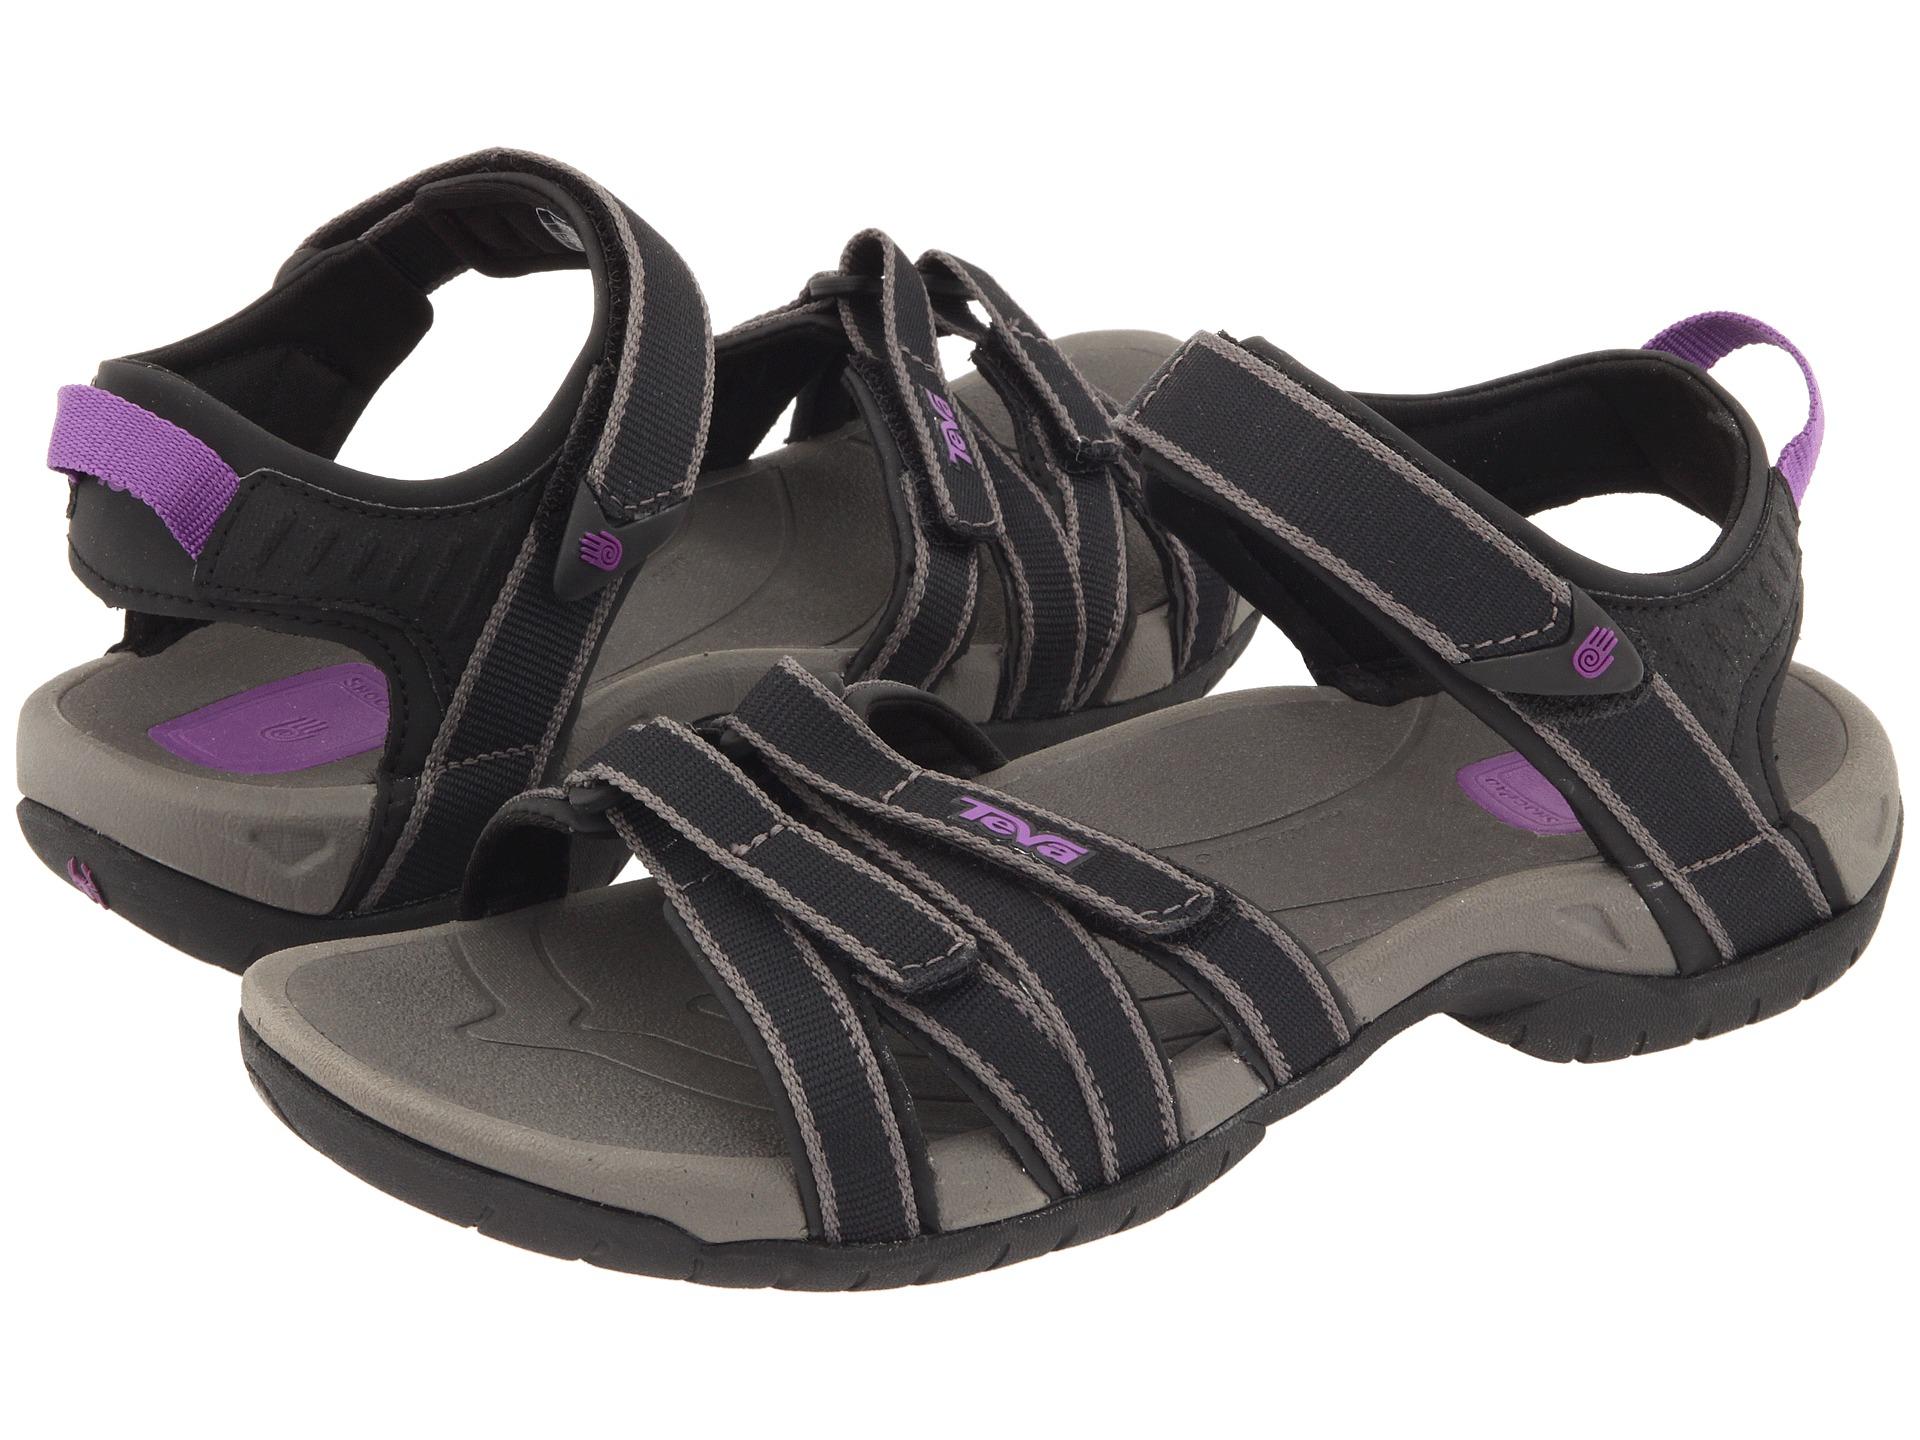 Women's sandals big w - Women's Sandals Big W 30